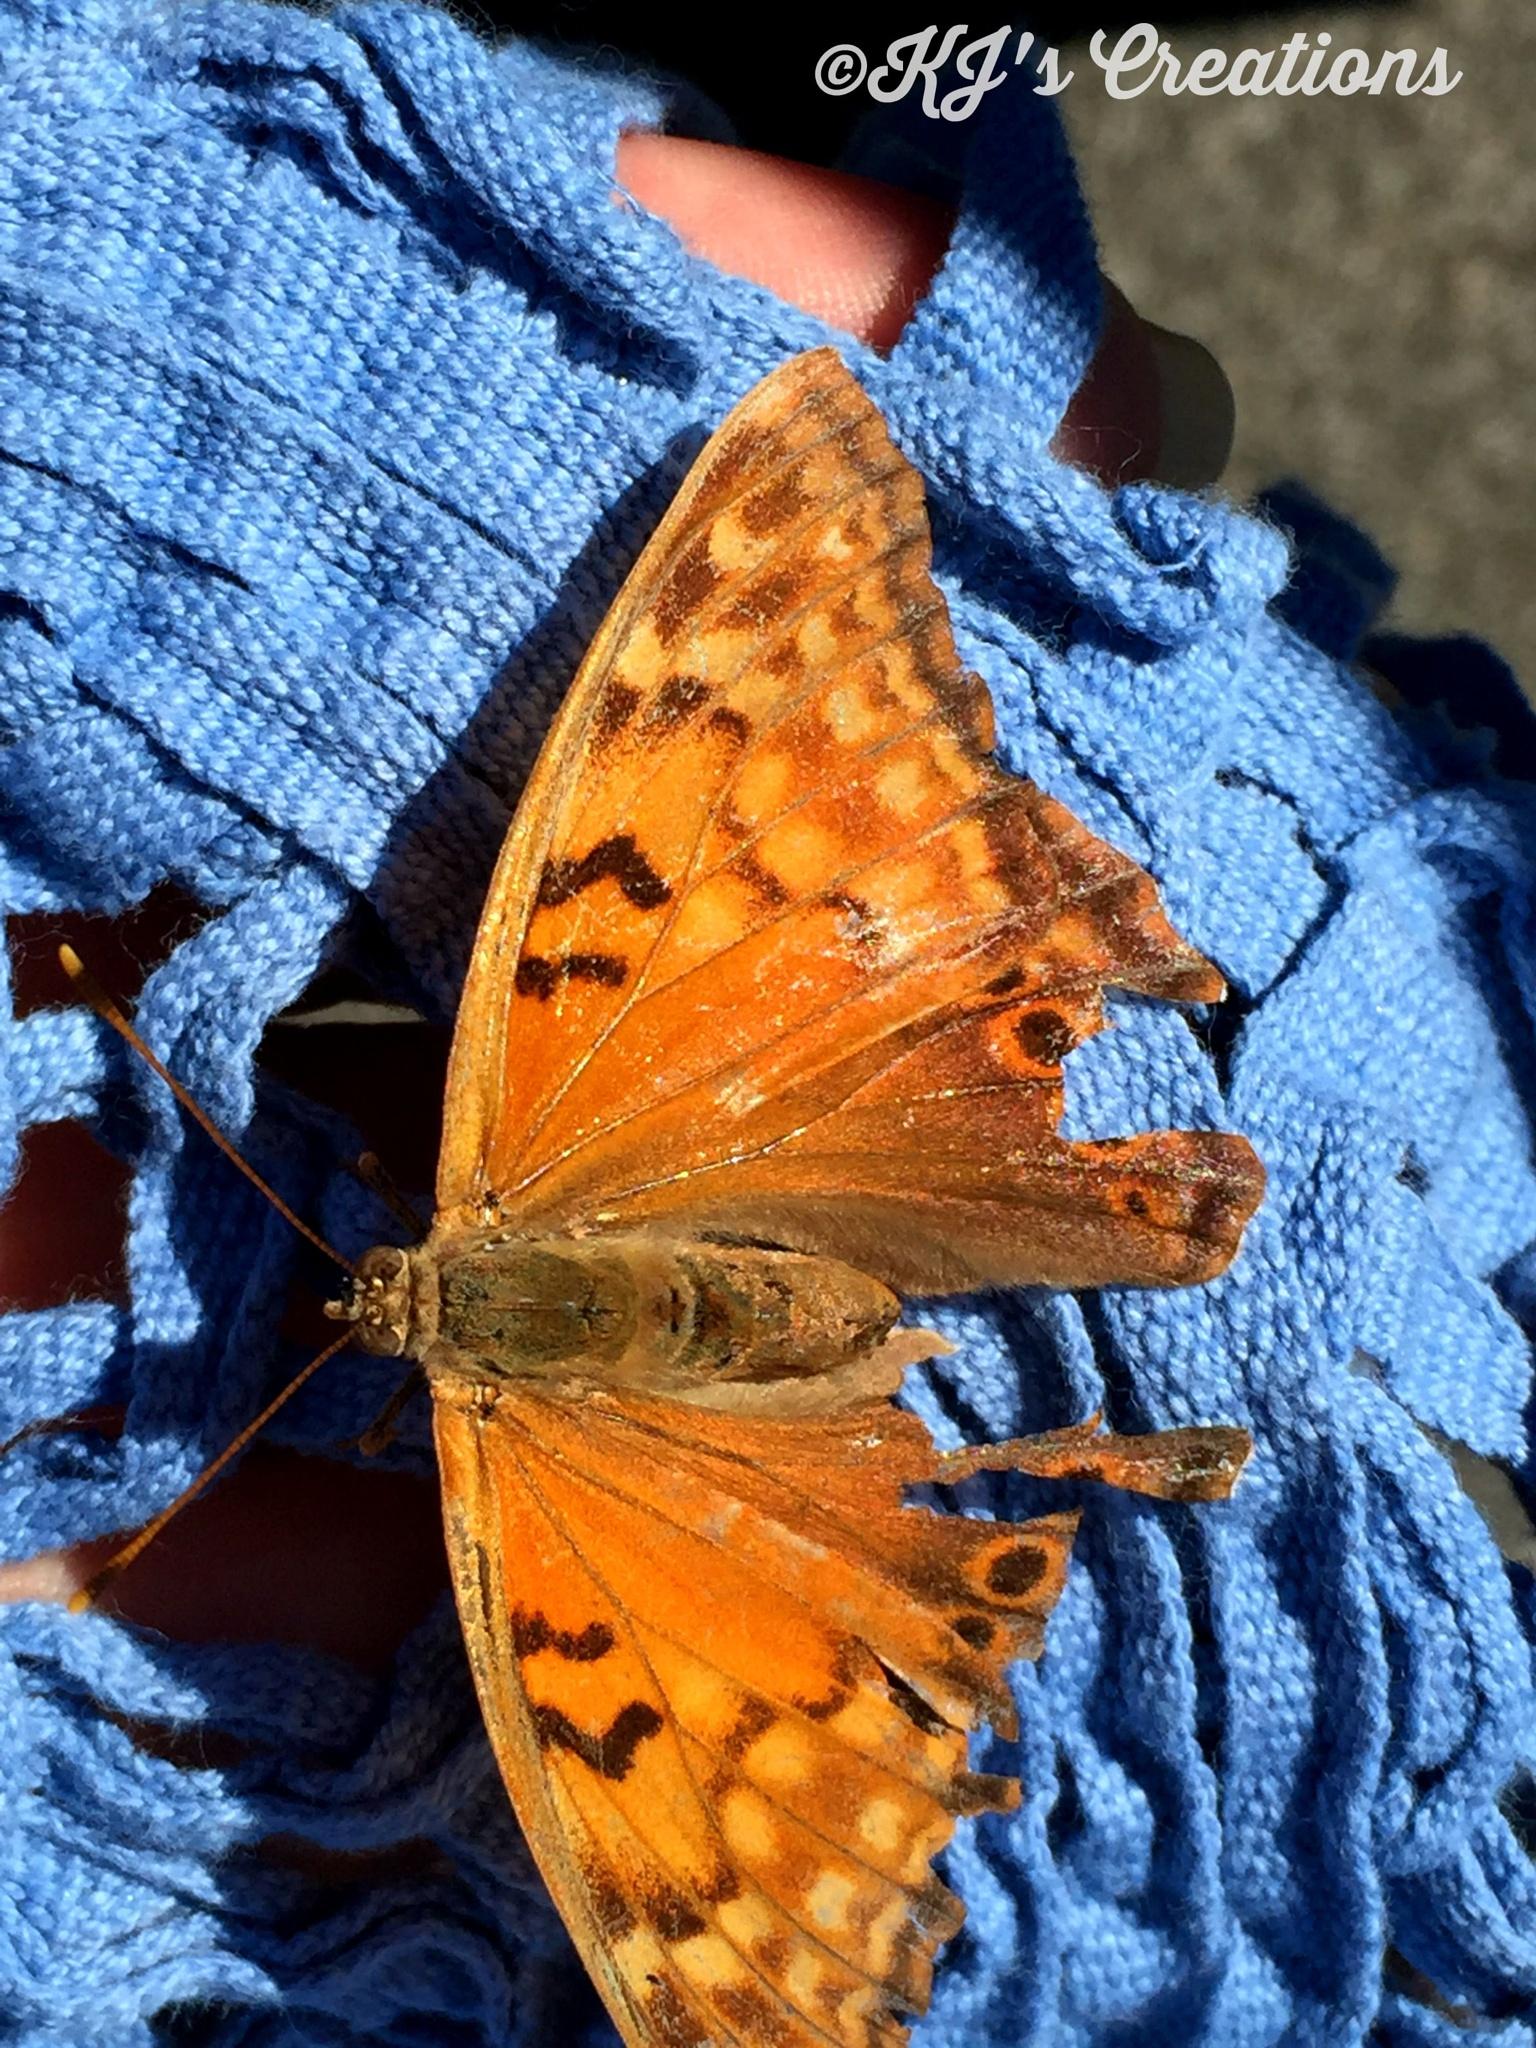 Broken butterfly-my buddy by kristin j clevenger